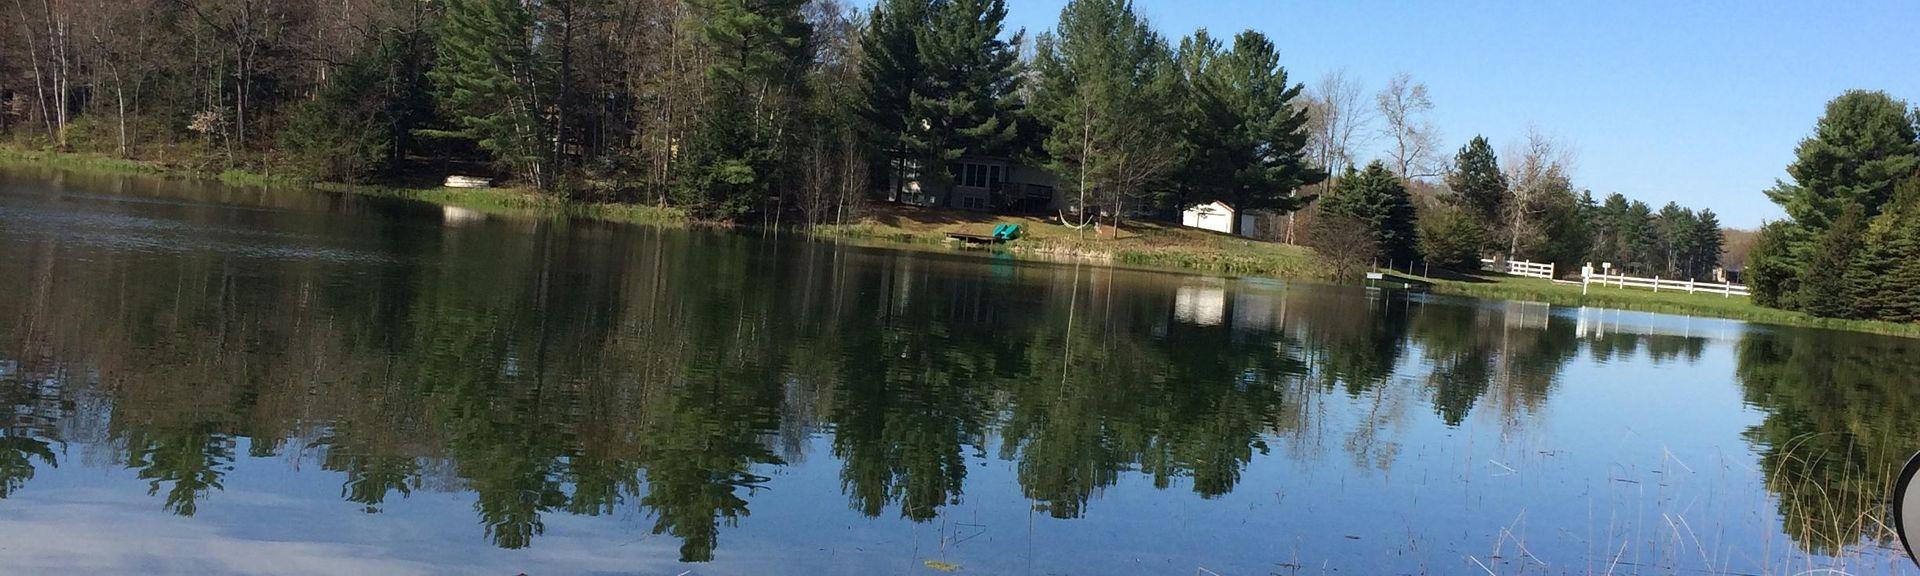 Hartwick Pines State Park, Grayling, Michigan, United States of America